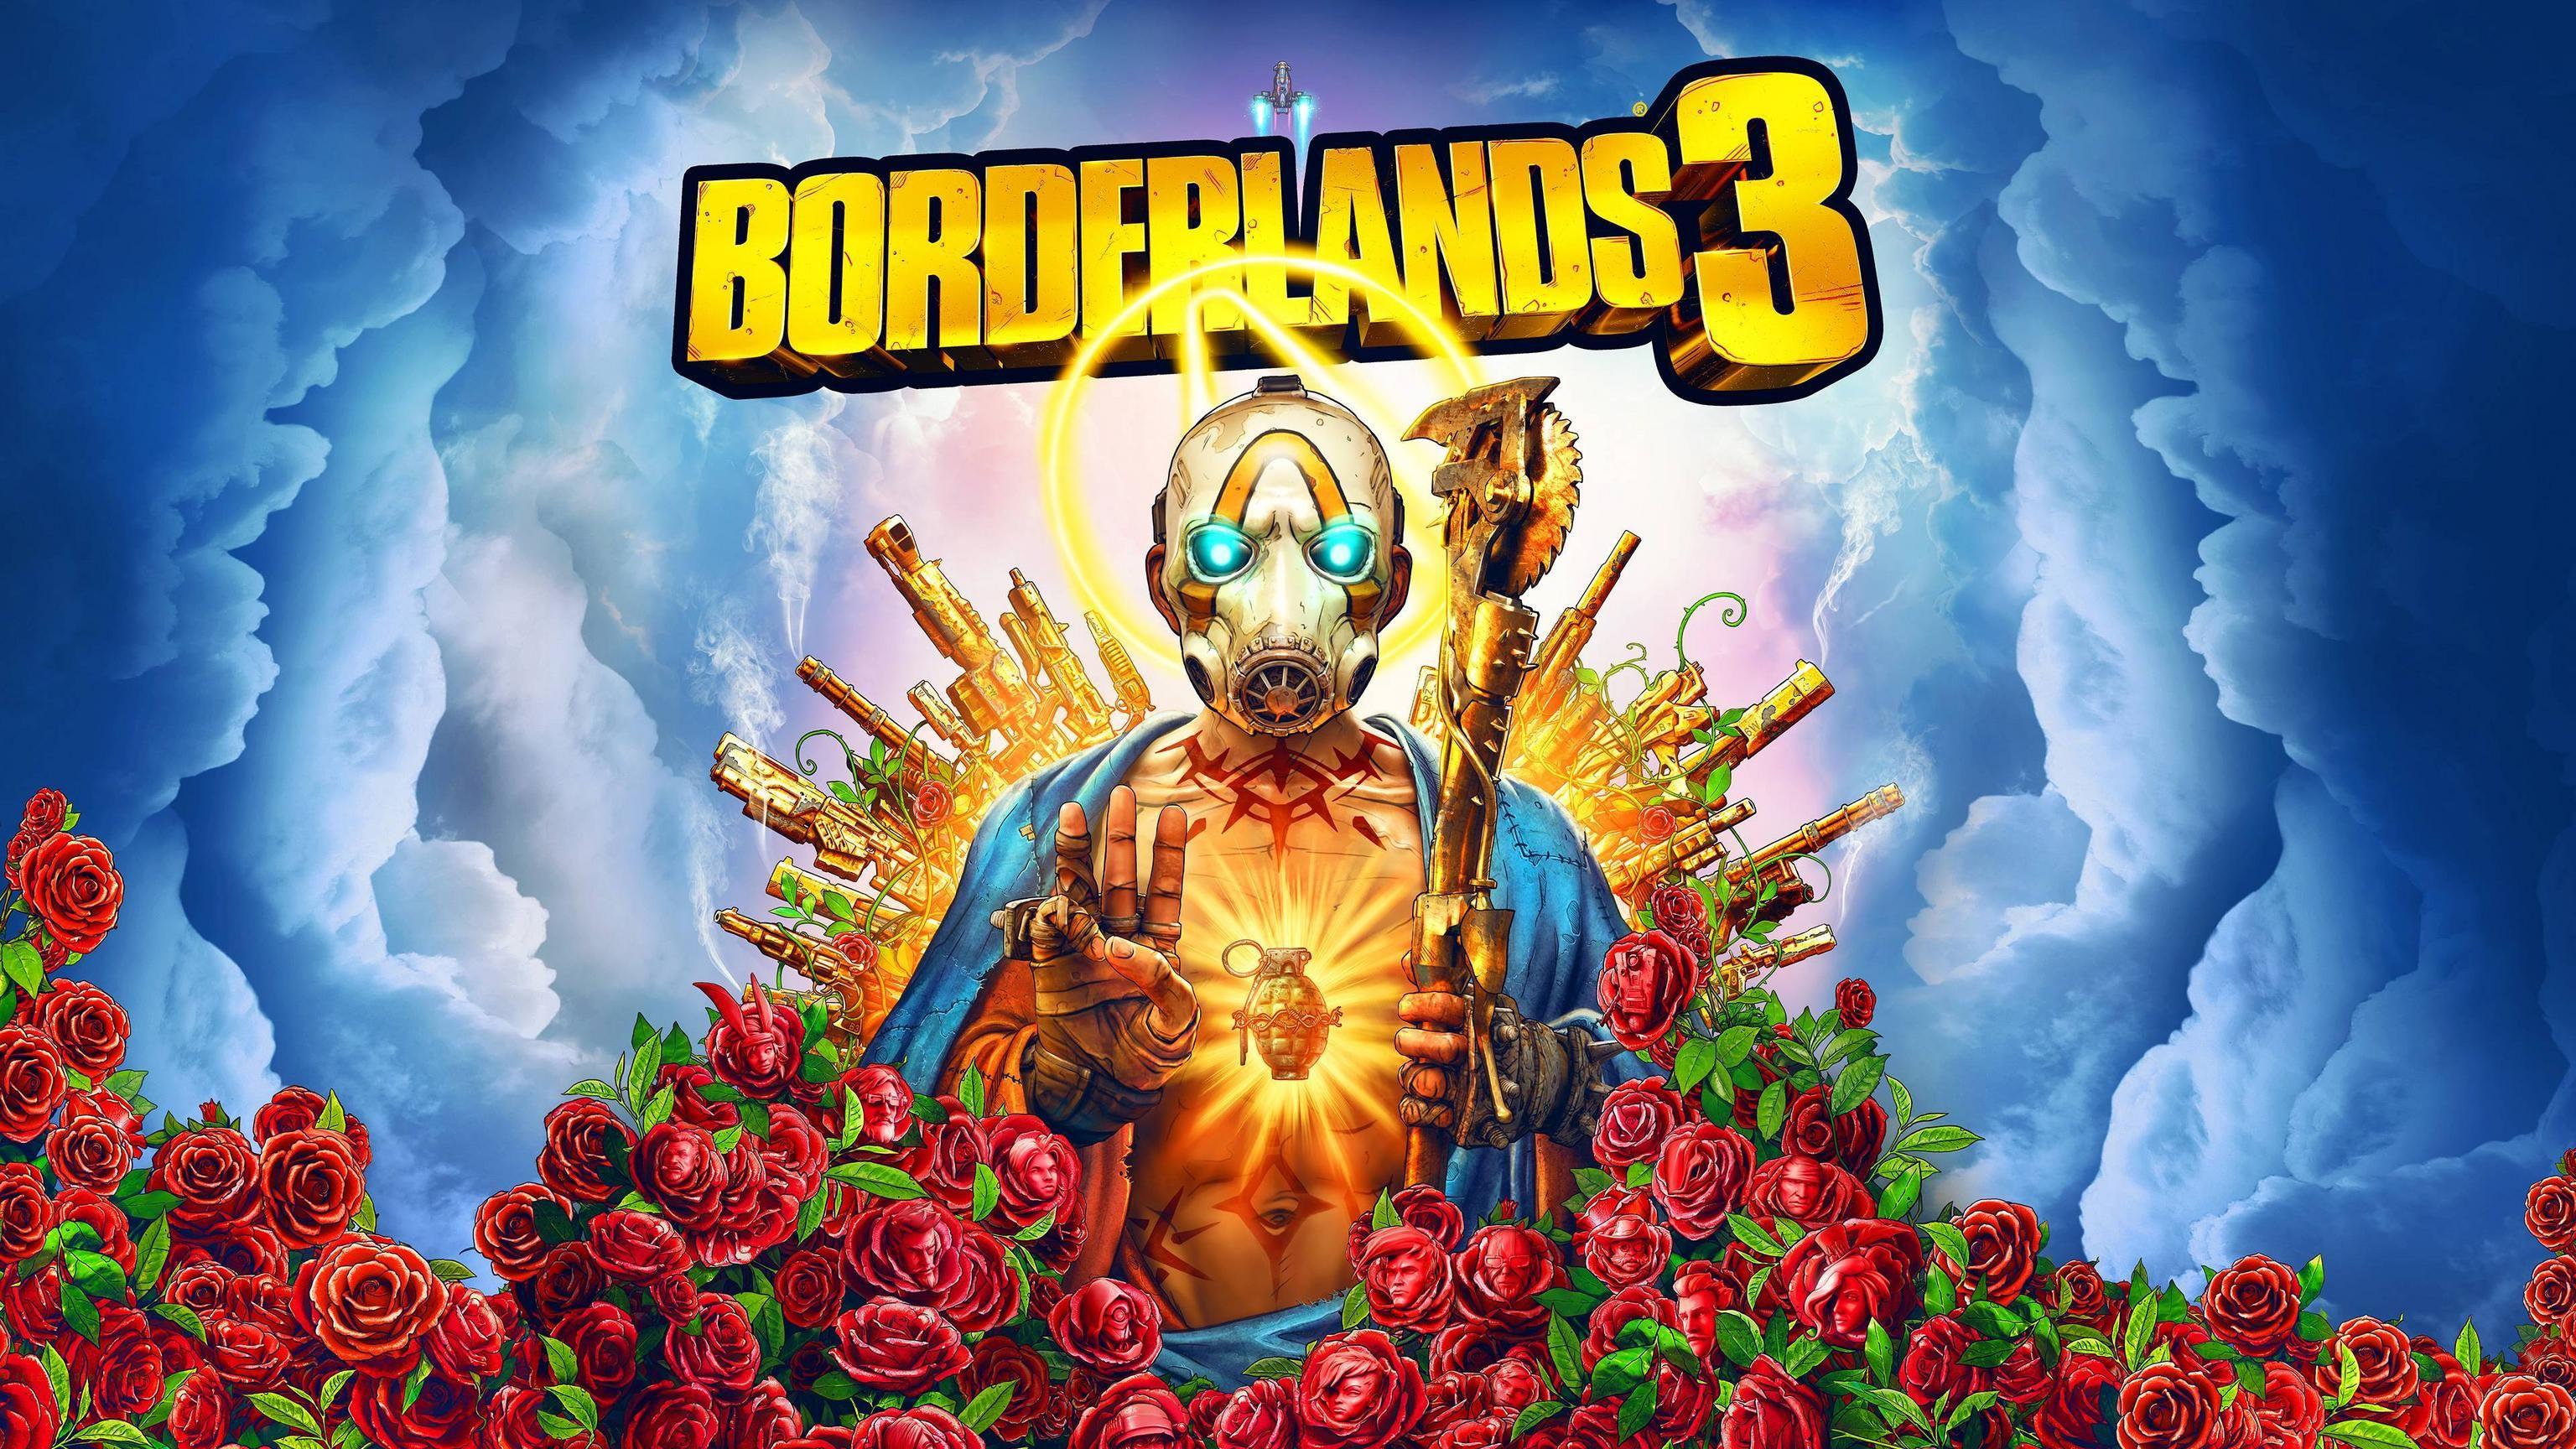 Borderlands 3 Cover Borderlands, Borderlands series